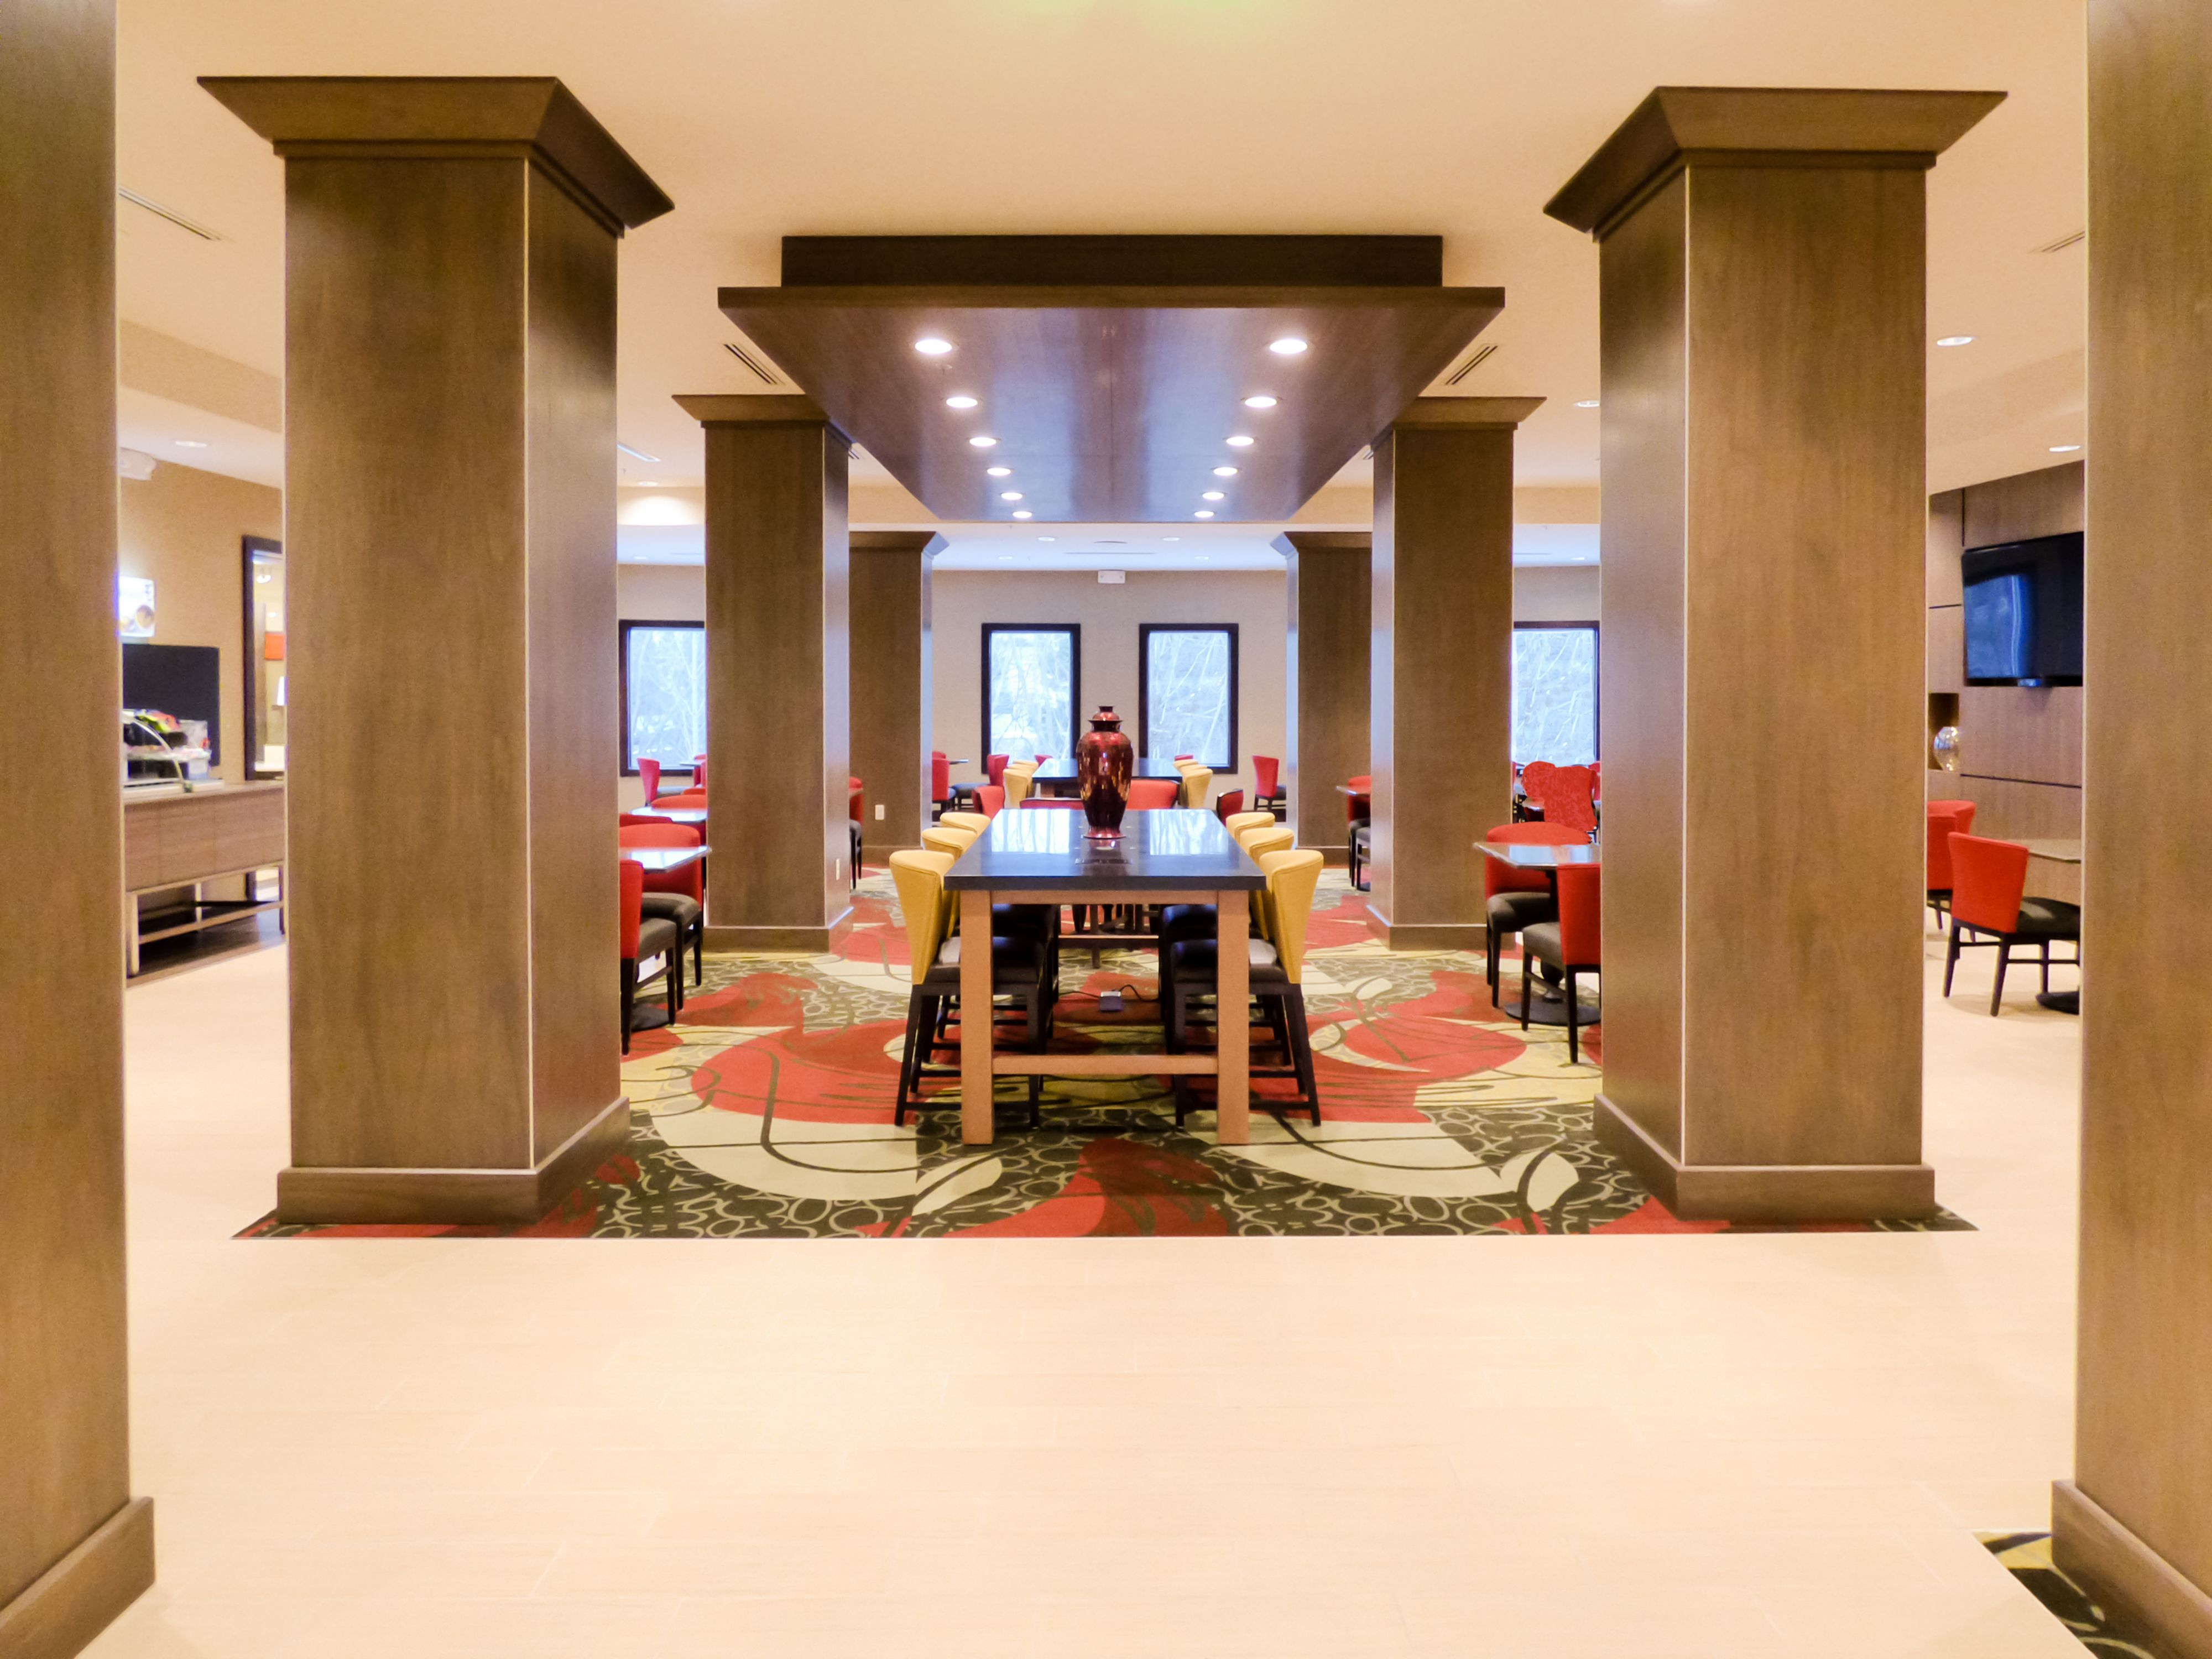 Holiday Inn Express Plymouth Ann Arbor Area, Plymouth